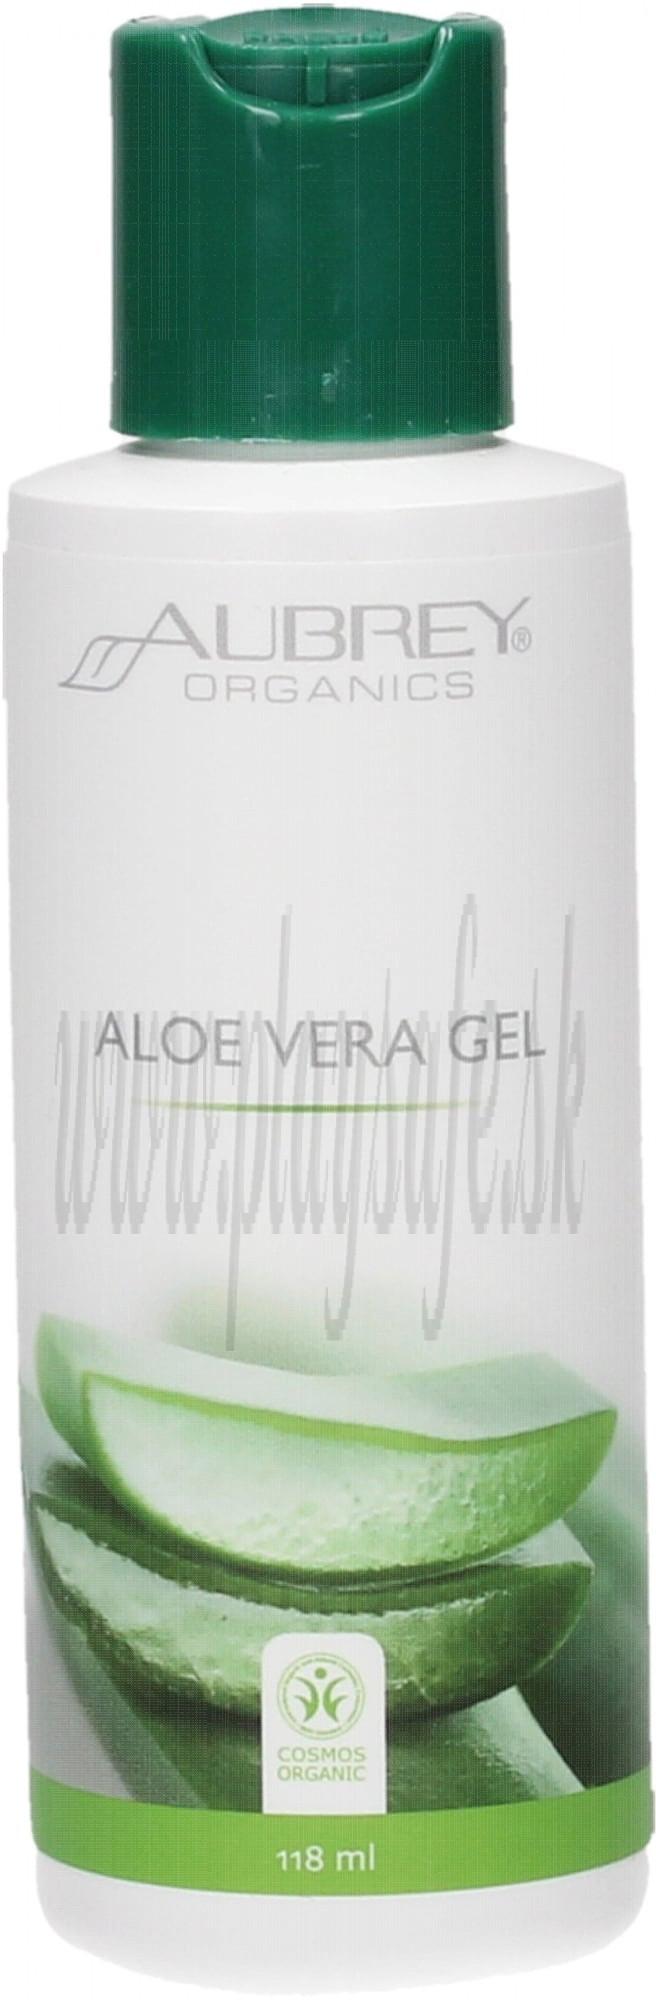 Aubrey Organics Pure Aloe Vera, 118ml